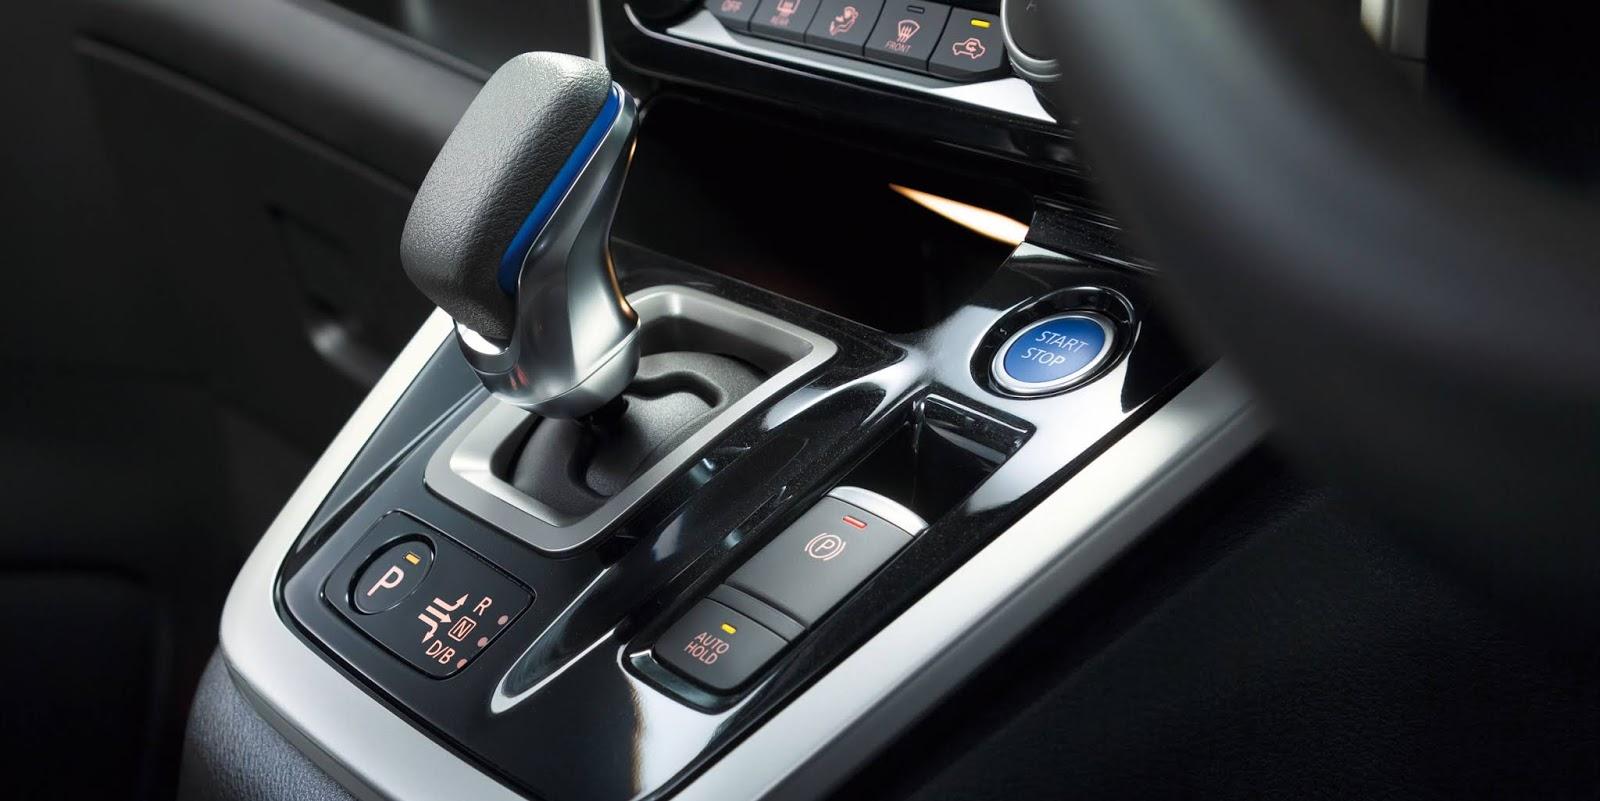 Nissan Serena e POWER 4 Βραβείο τεχνολογίας για το e-POWER της Nissan Electric cars, Nissan, βραβείο, Τεχνολογία